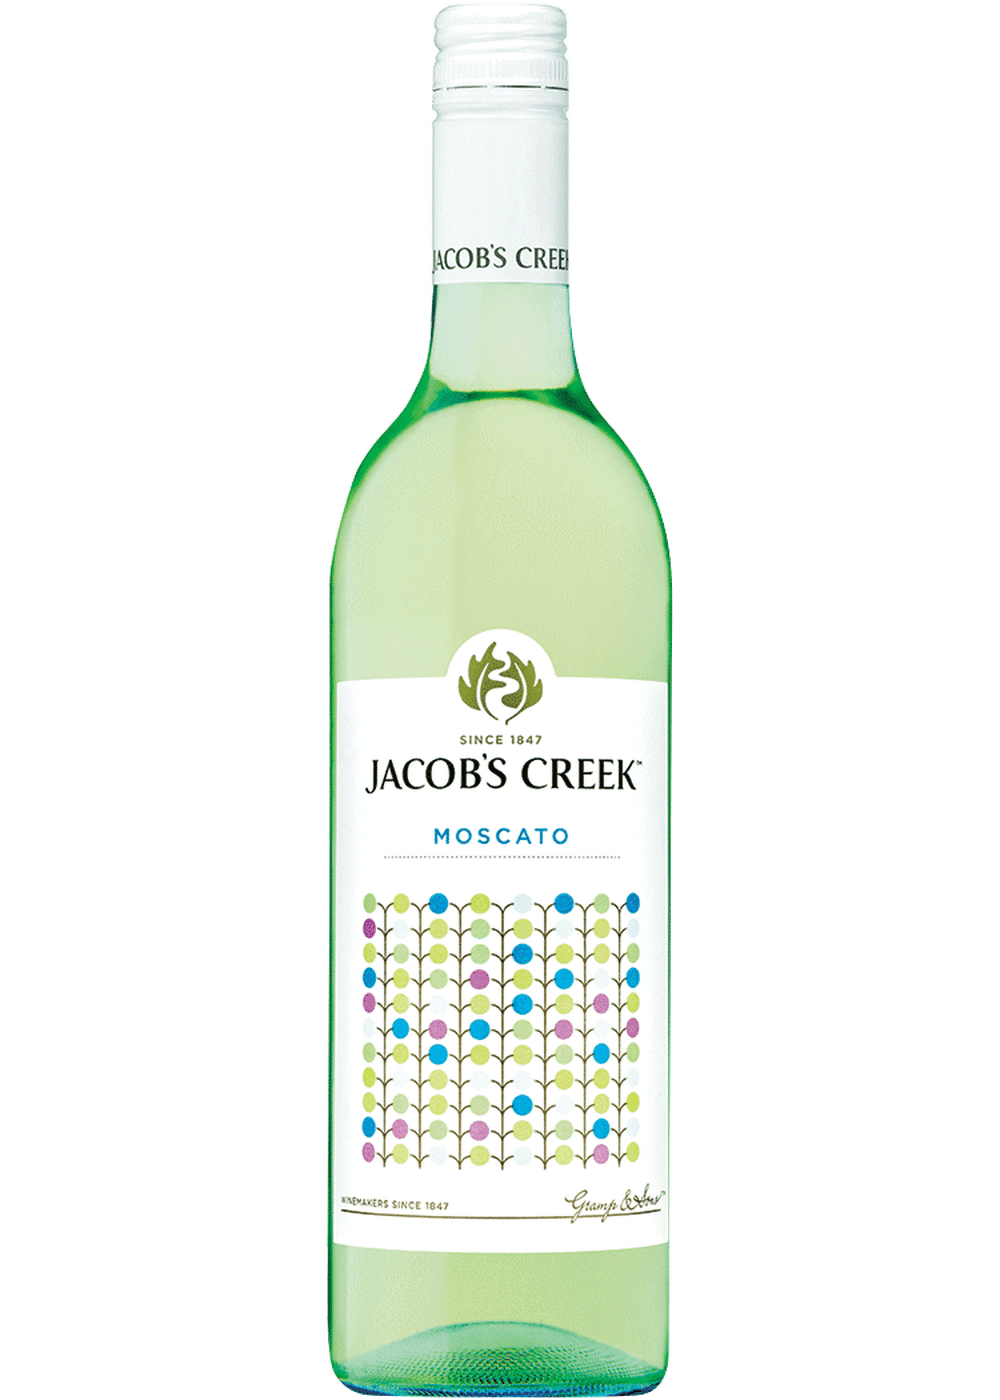 Jacobs Creek Moscato 750ml NV